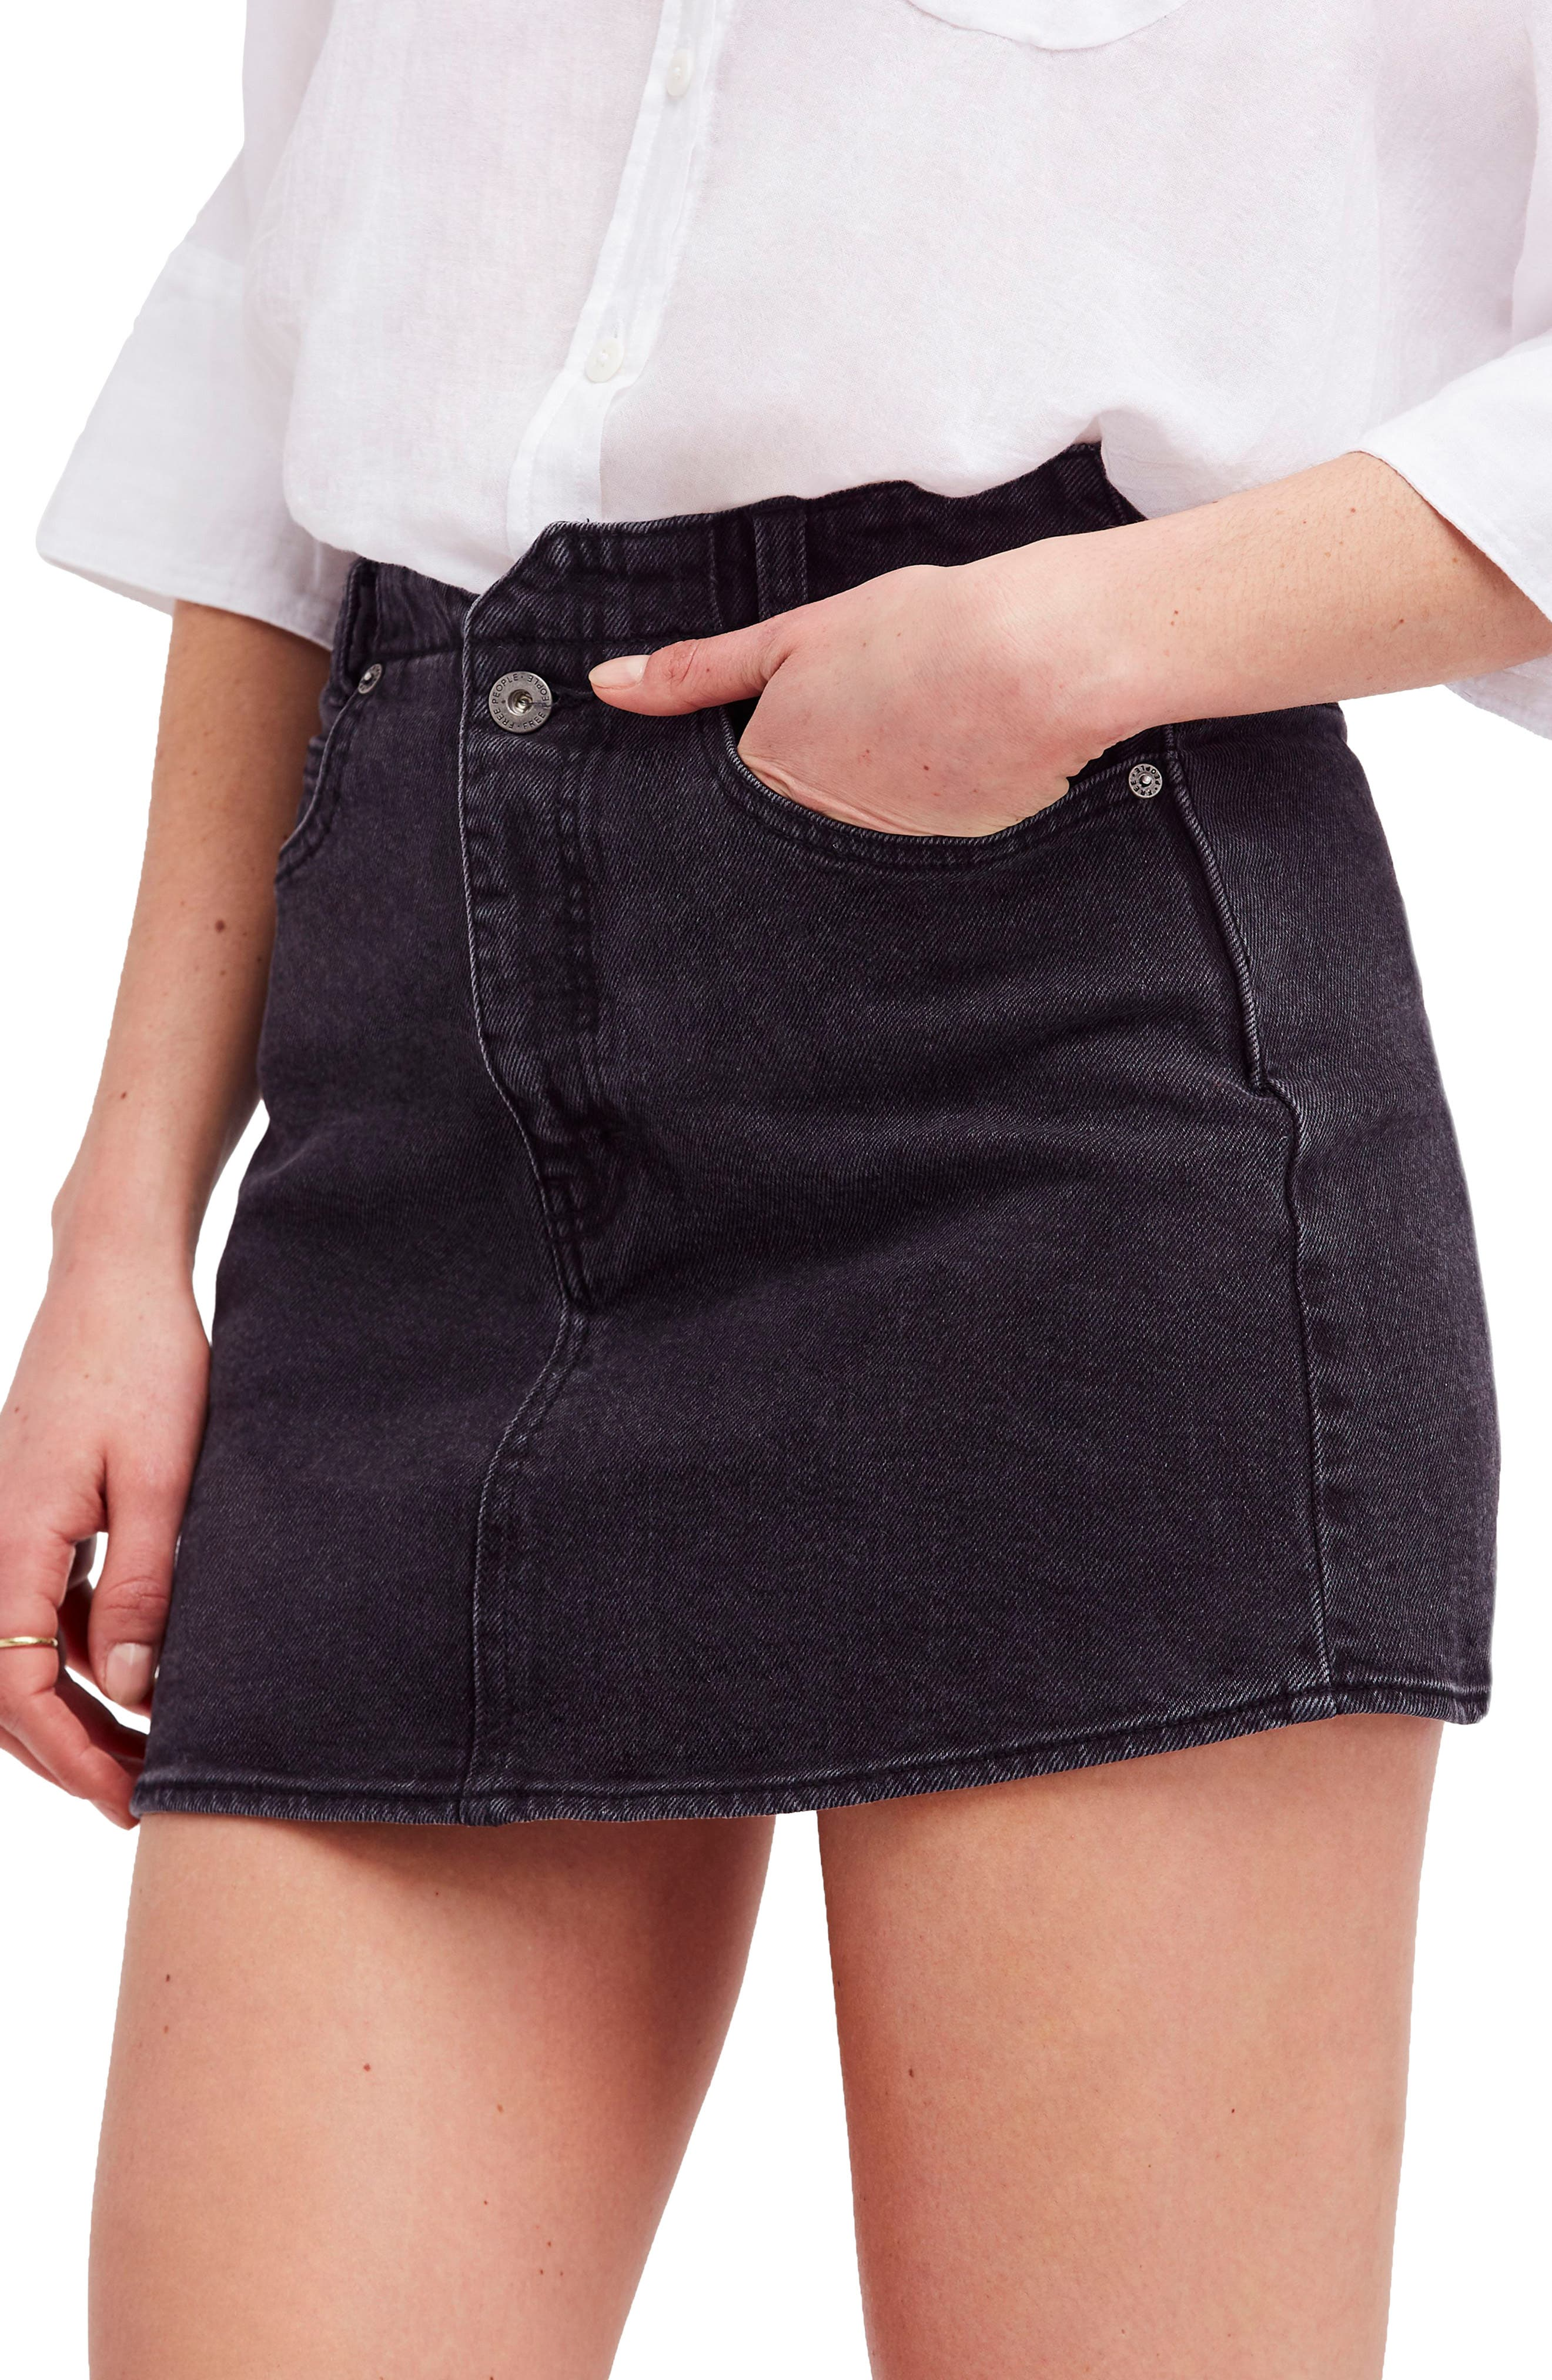 She's All That Denim Miniskirt,                             Main thumbnail 1, color,                             Black